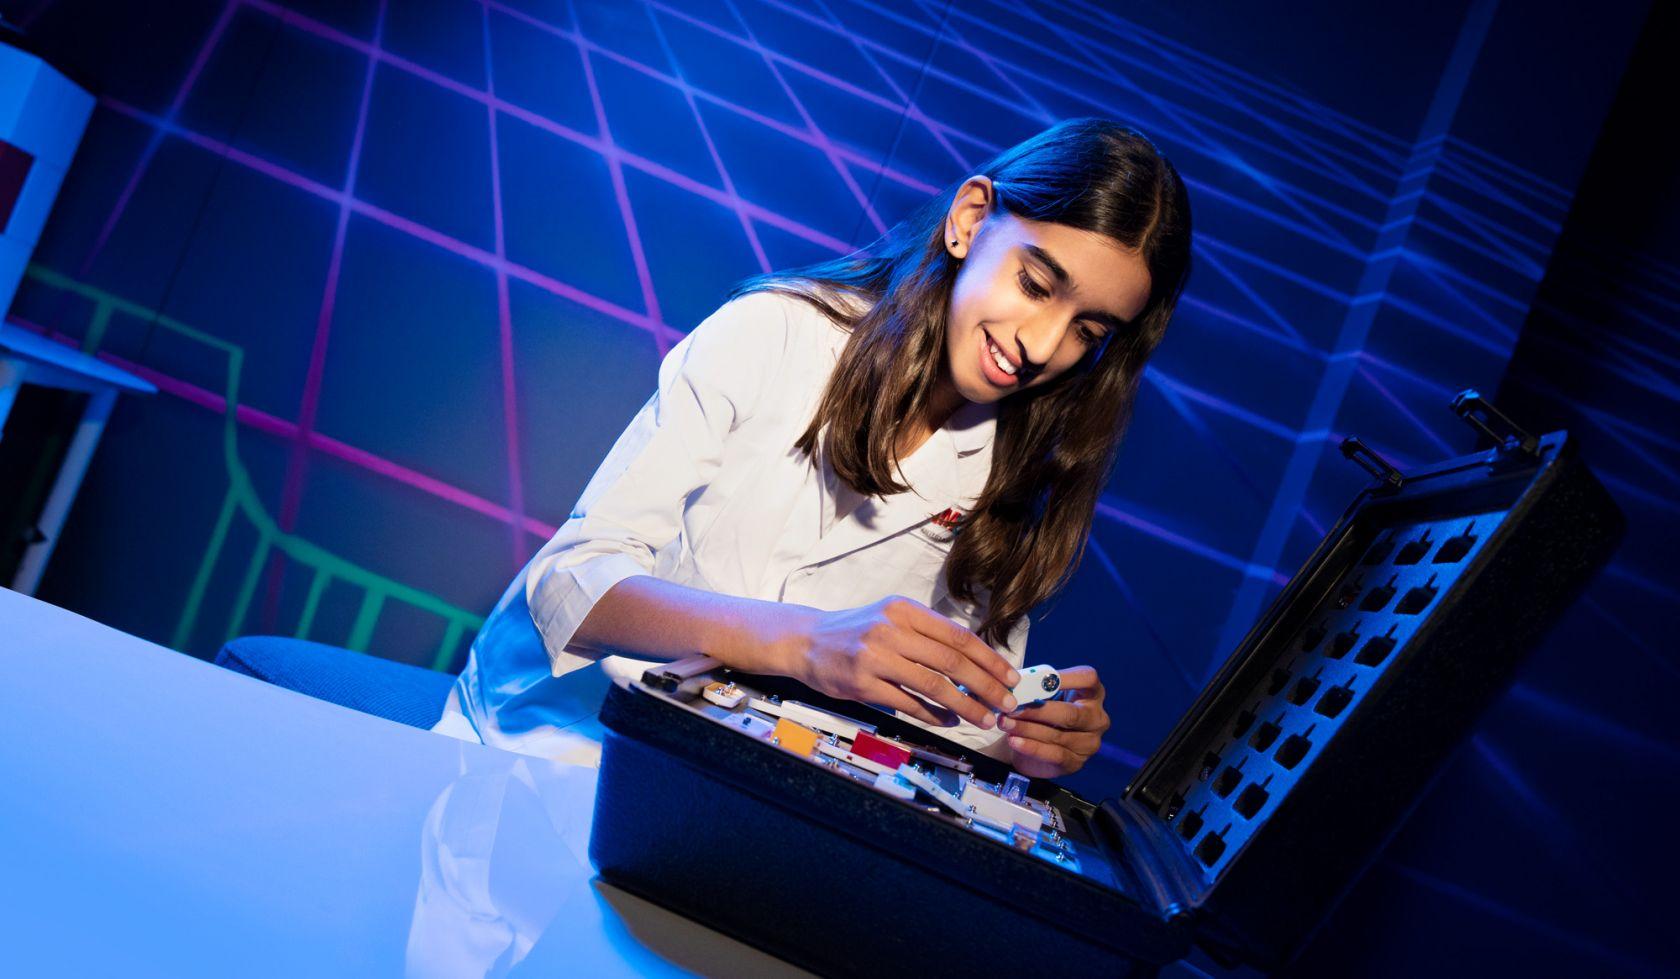 dreamcity melbourne edutainment stem scientist